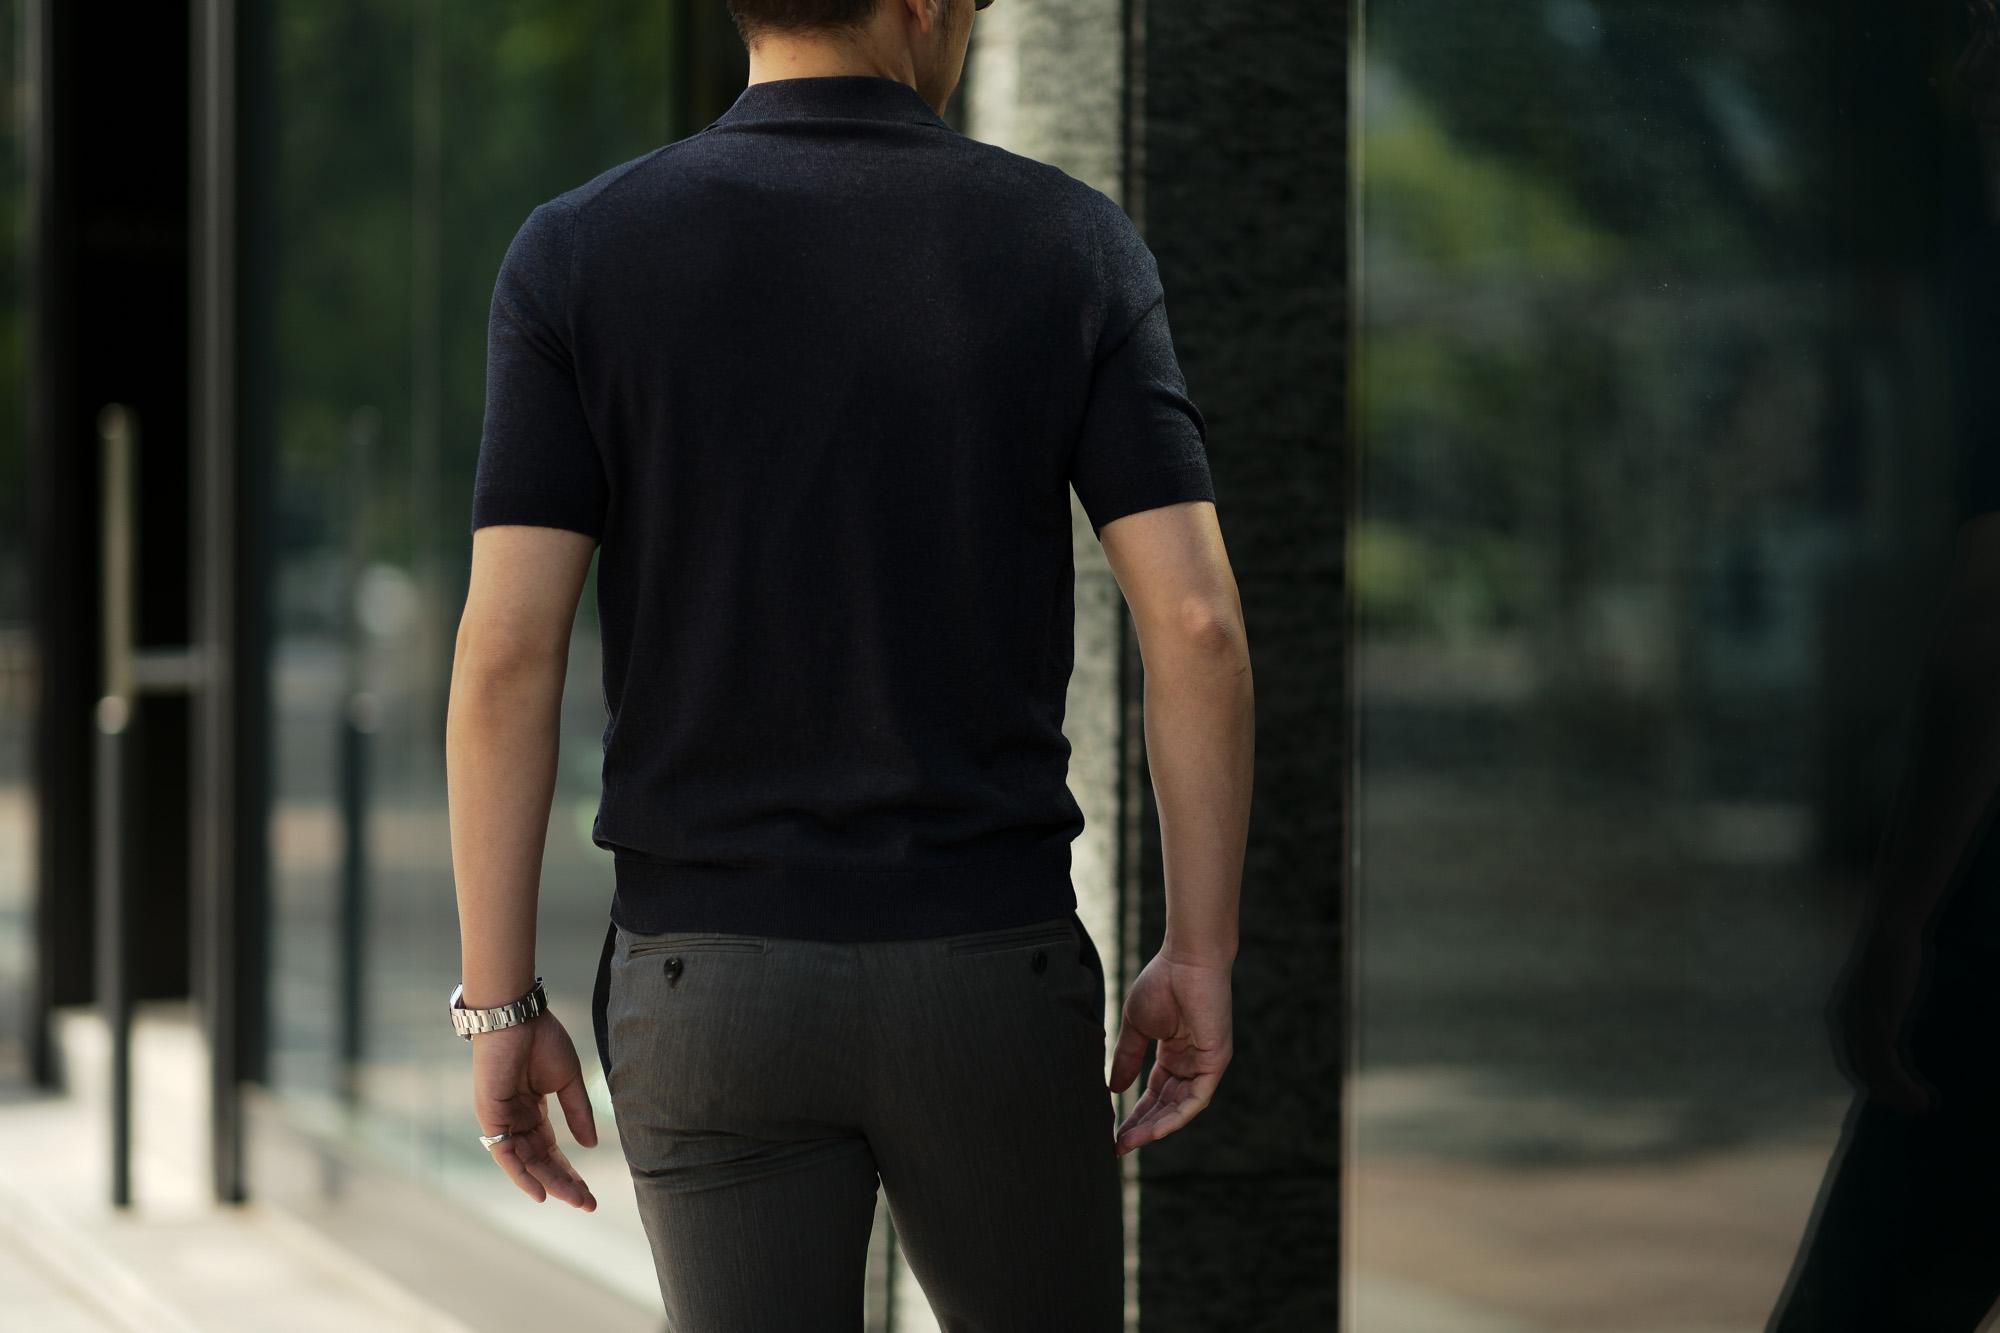 Gran Sasso (グランサッソ) Silk Knit Polo Shirt (シルクニットポロシャツ) SETA (シルク 100%) シルク ニット ポロシャツ NAVY (ネイビー・597) made in italy (イタリア製) 2020 春夏新作 愛知 名古屋 altoediritto アルトエデリット